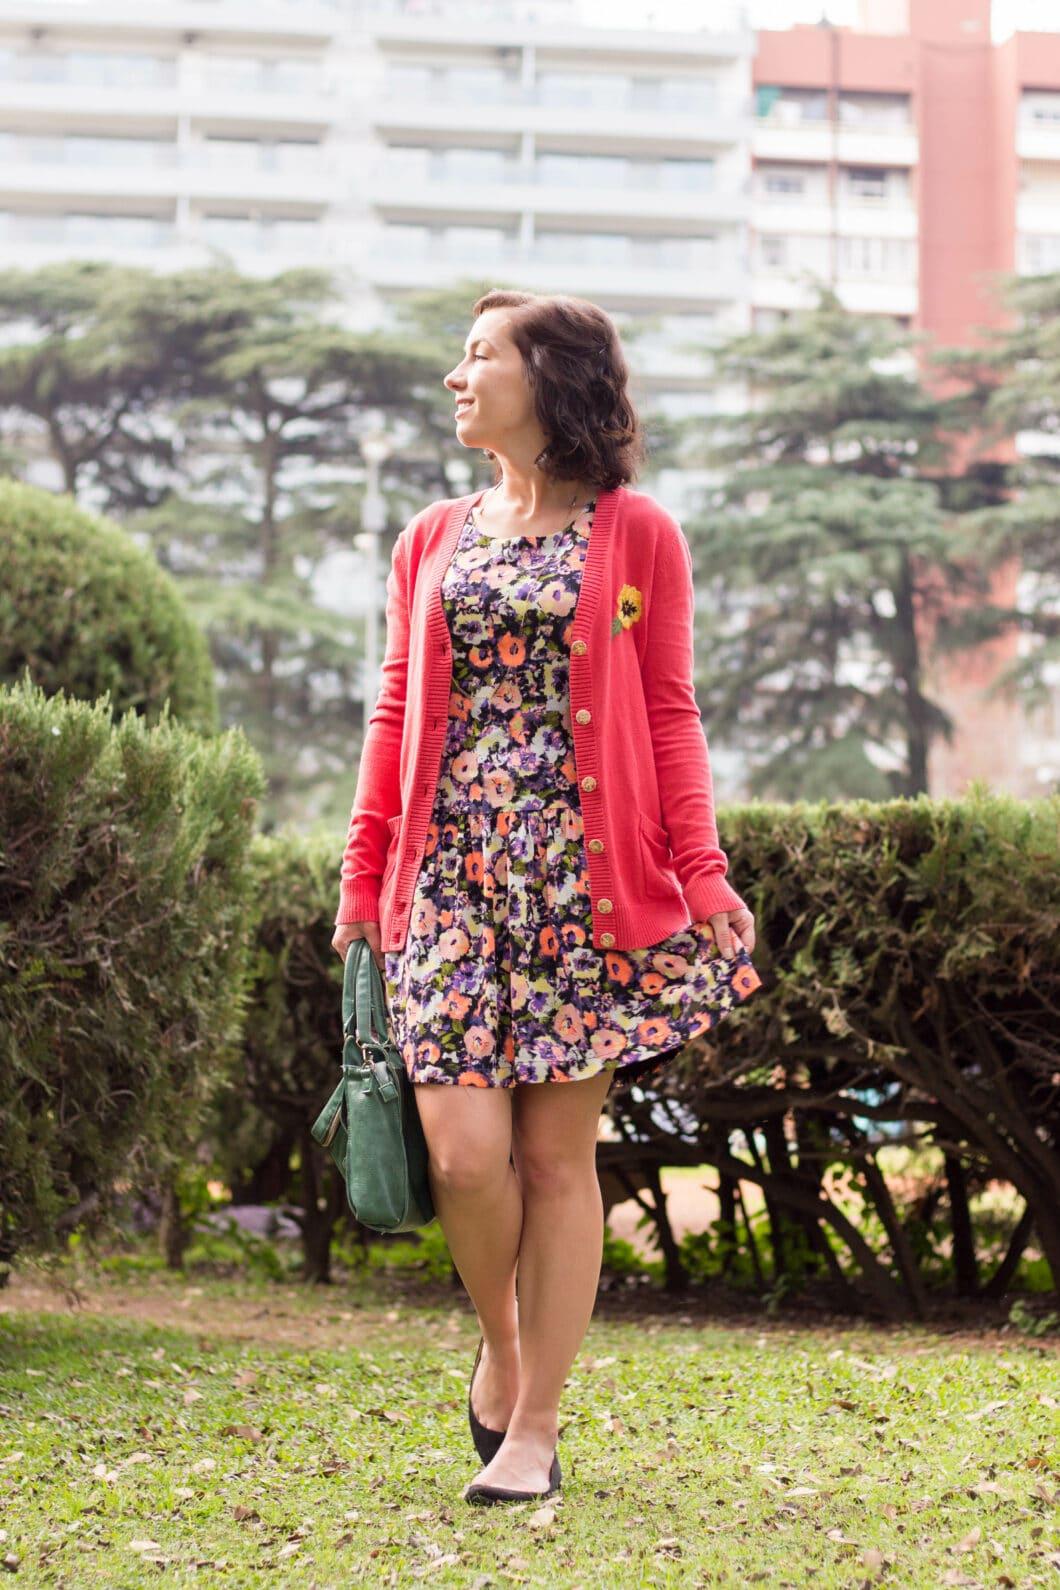 Secondhand Summer Dress & Online Thrifting